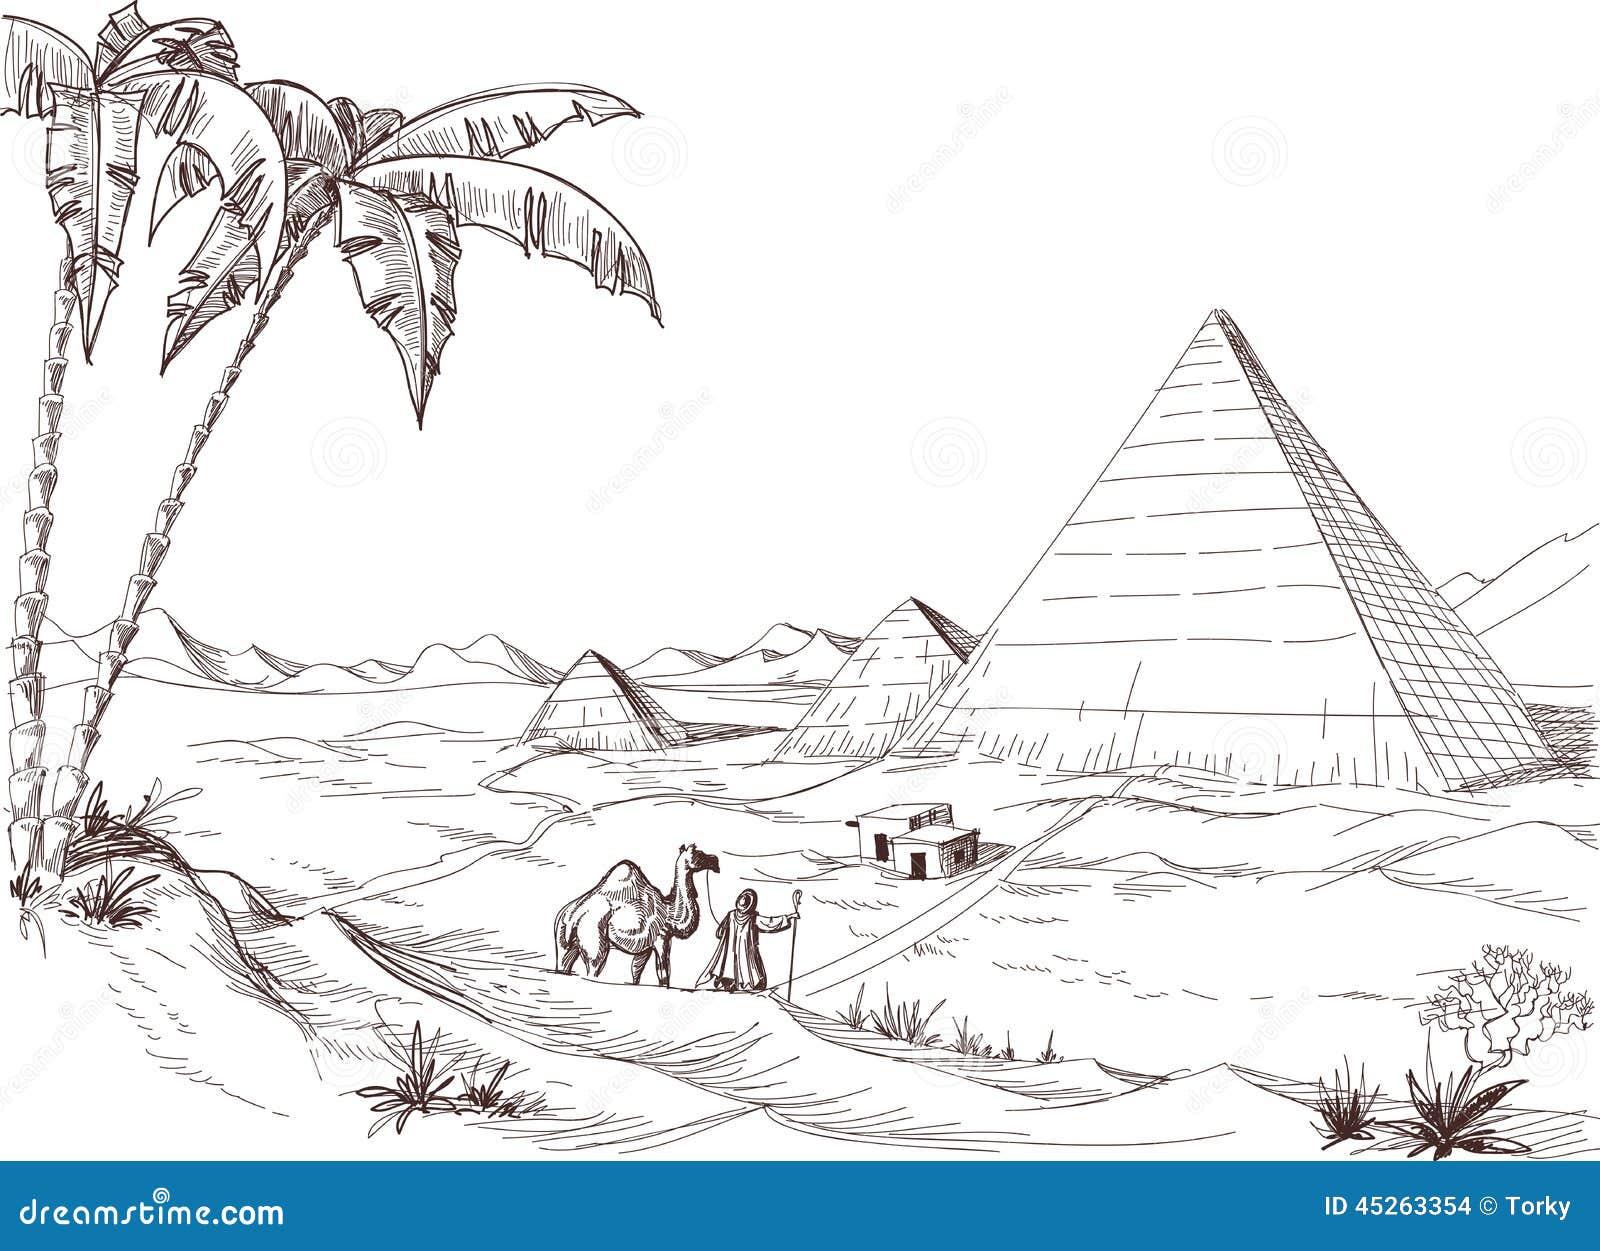 Desert Sketch Stock Vector Image 45263354